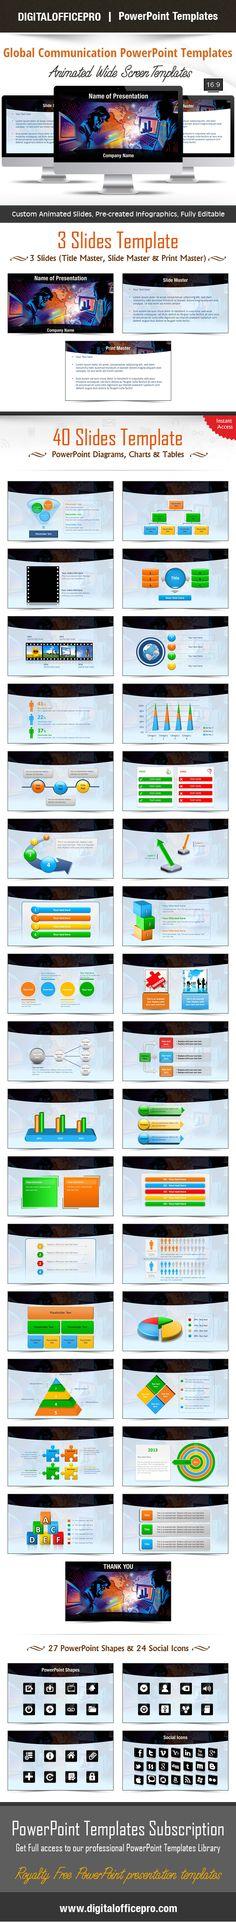 Cmo crear fabulosas infografas con powerpoint infographic cmo crear fabulosas infografas con powerpoint infographic infographics and create infographics toneelgroepblik Gallery